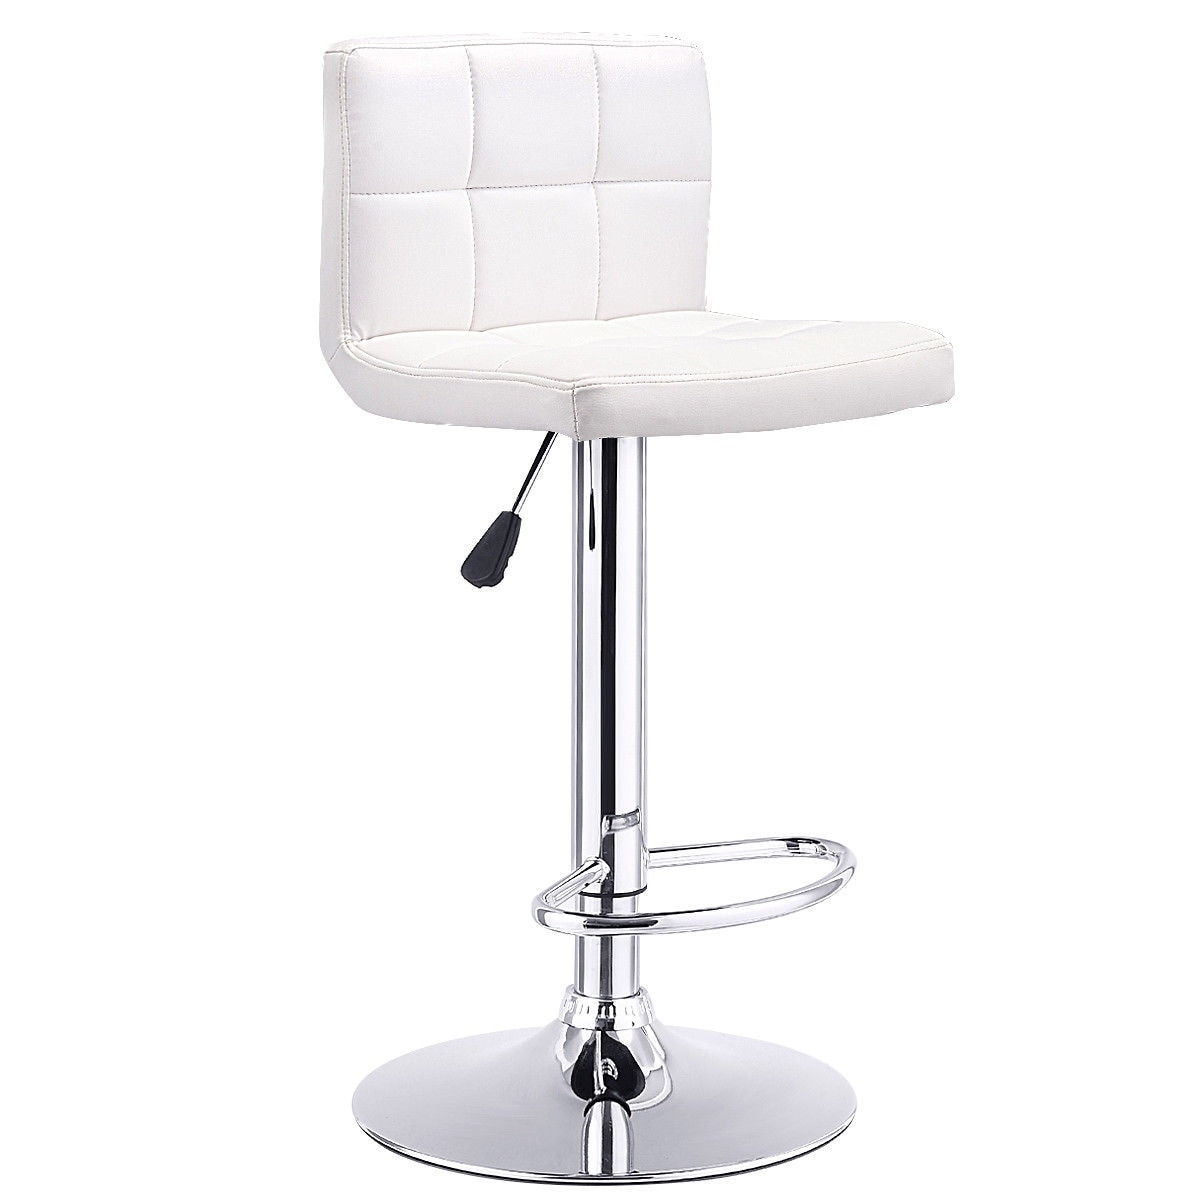 Surprising Costway 1 Pc Bar Stool Swivel Adjustable Pu Leather Barstools Bistro Pub Chair White Machost Co Dining Chair Design Ideas Machostcouk